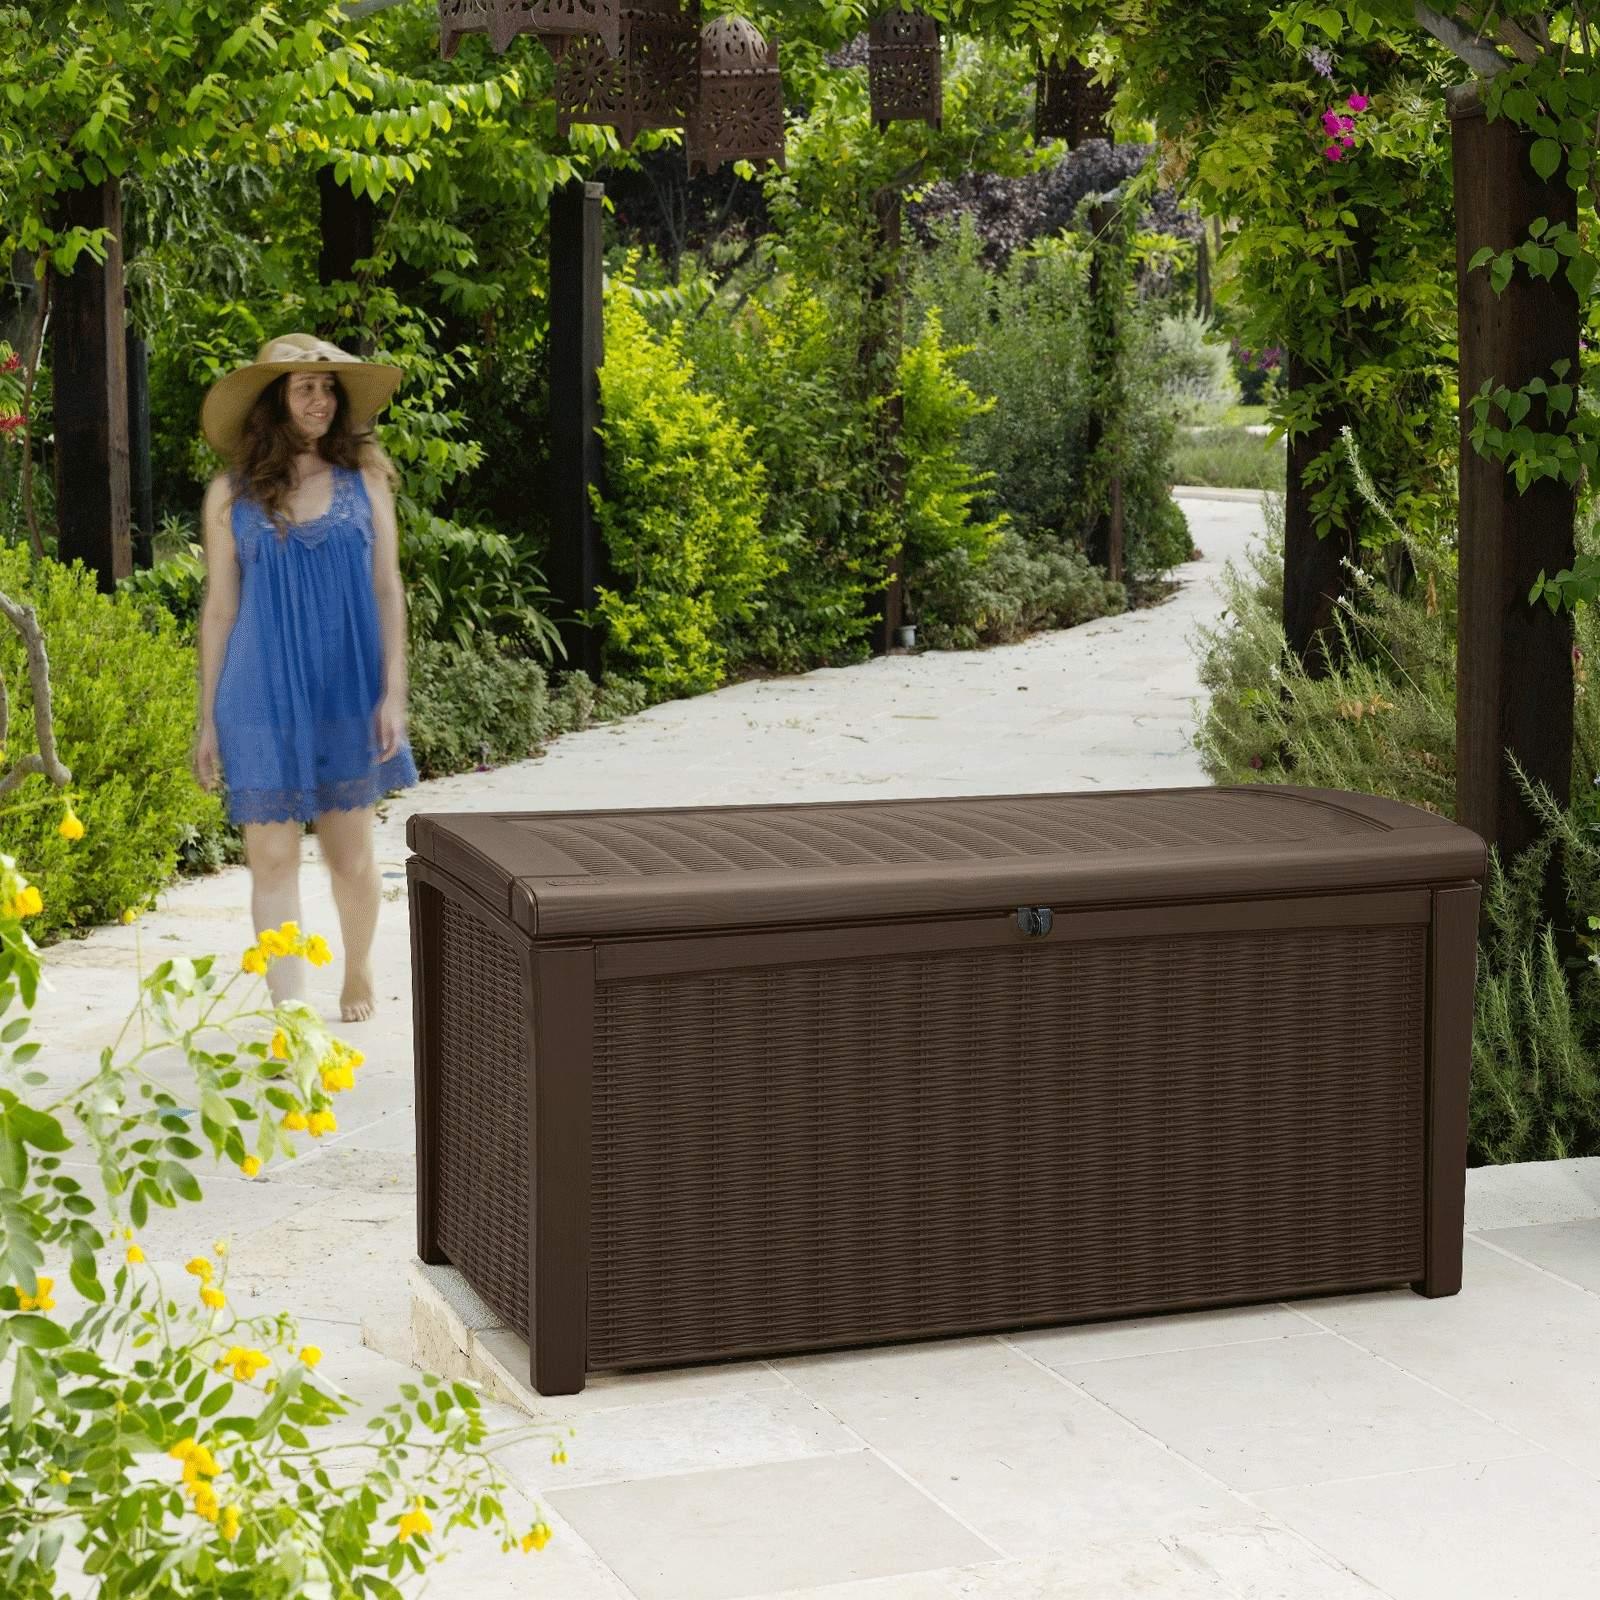 Keter Garten Box Aufbewahrungsbox Holzoptik Bo 2